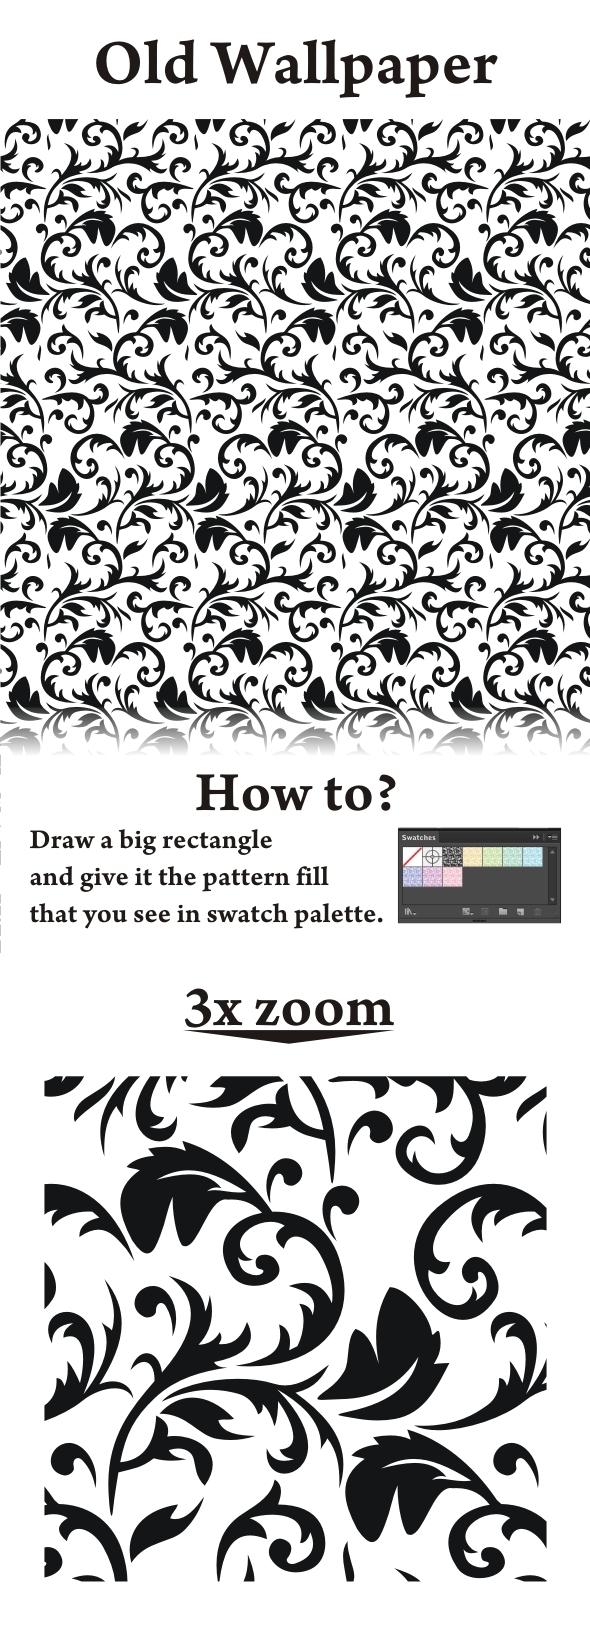 Old Wallpaper - Artistic Textures / Fills / Patterns